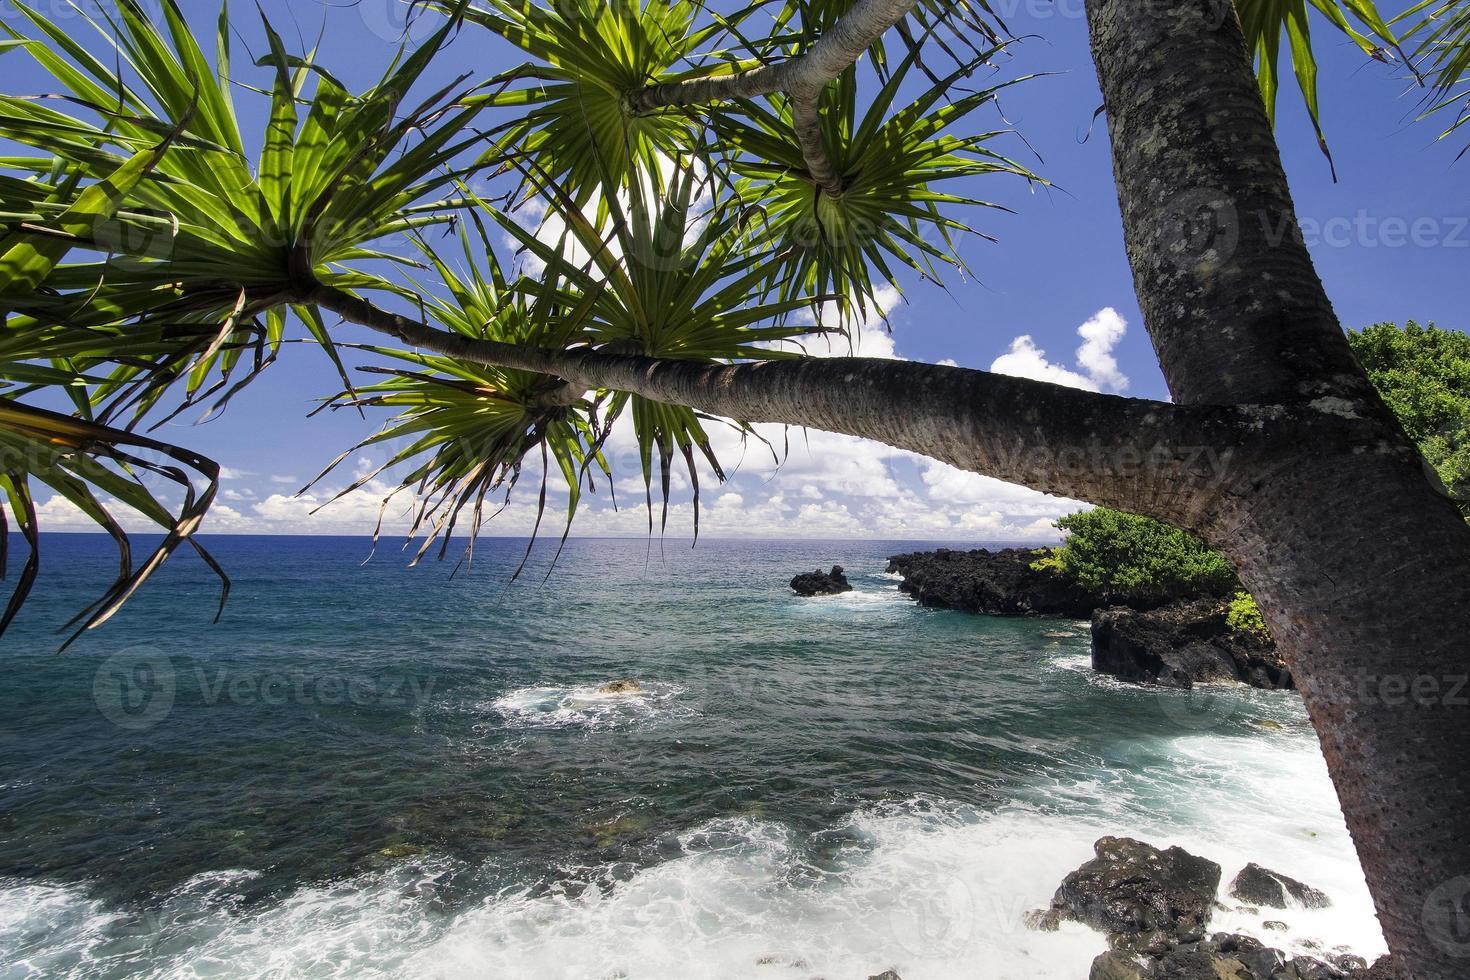 palmboom, noordelijke kust, weg naar hana, maui, hawaii foto